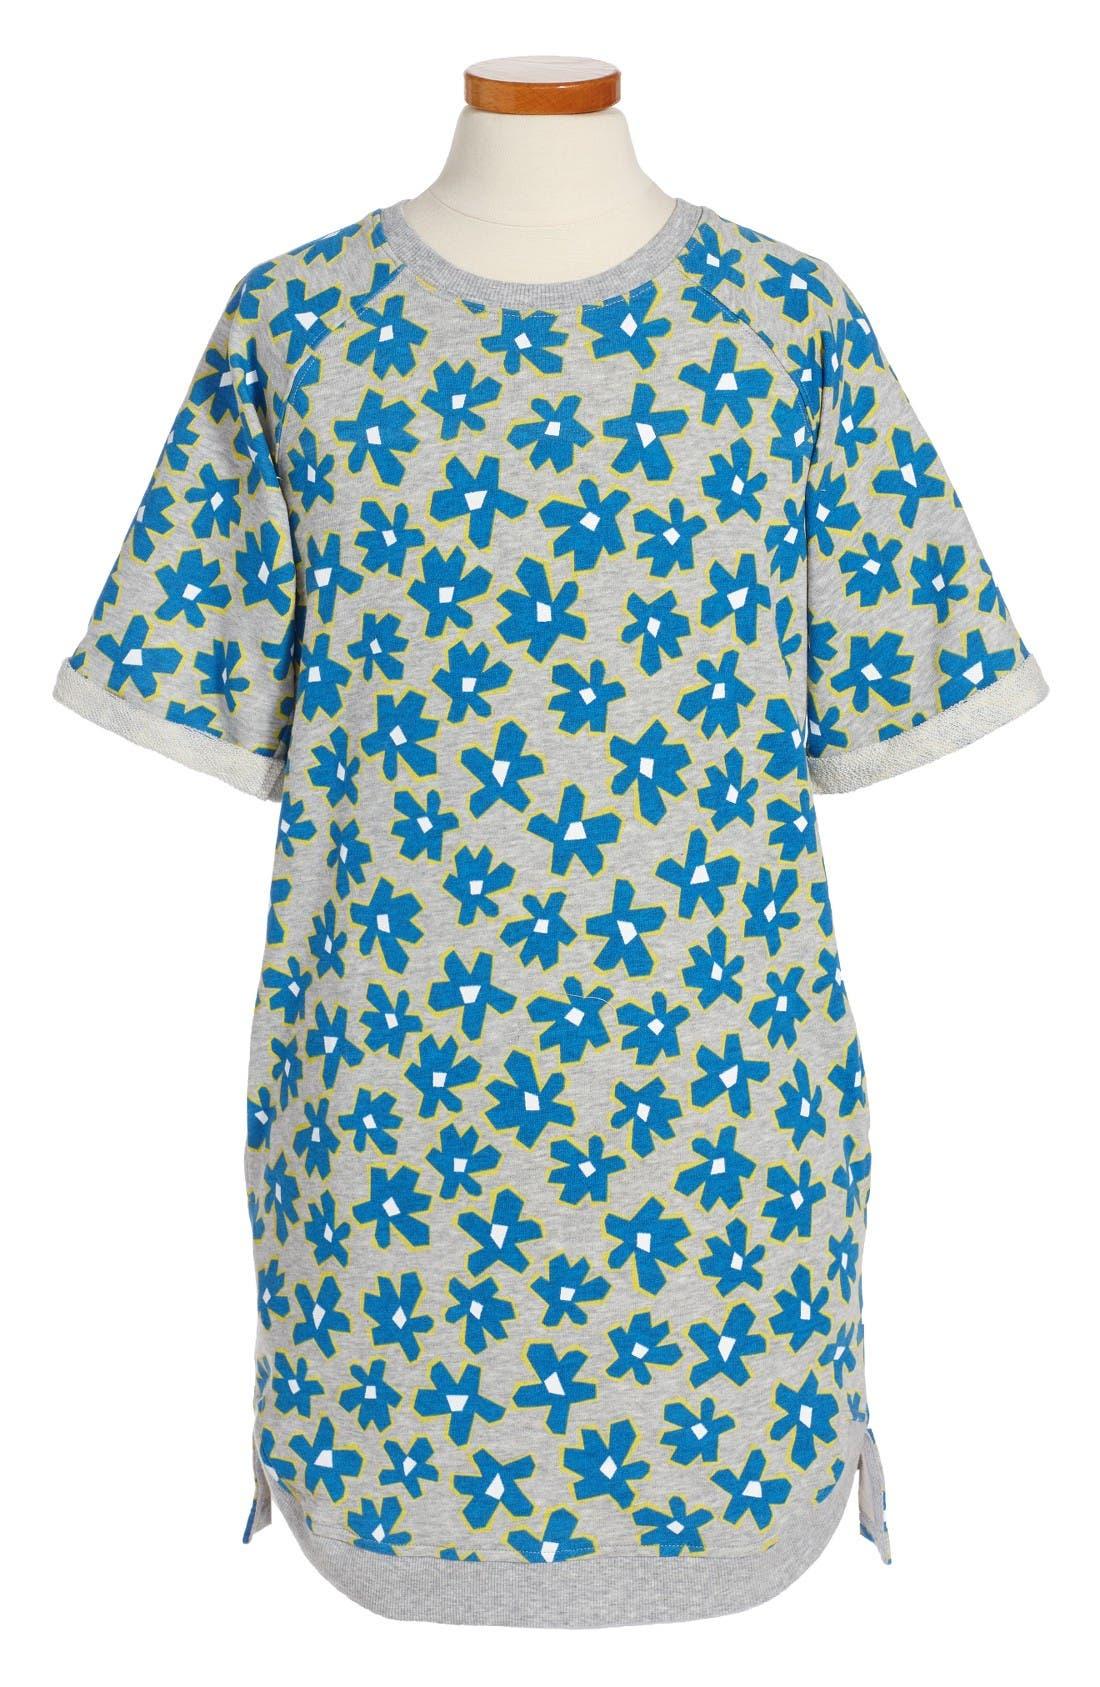 STELLA MCCARTNEY KIDS Stella McCartney Margot T-Shirt Dress